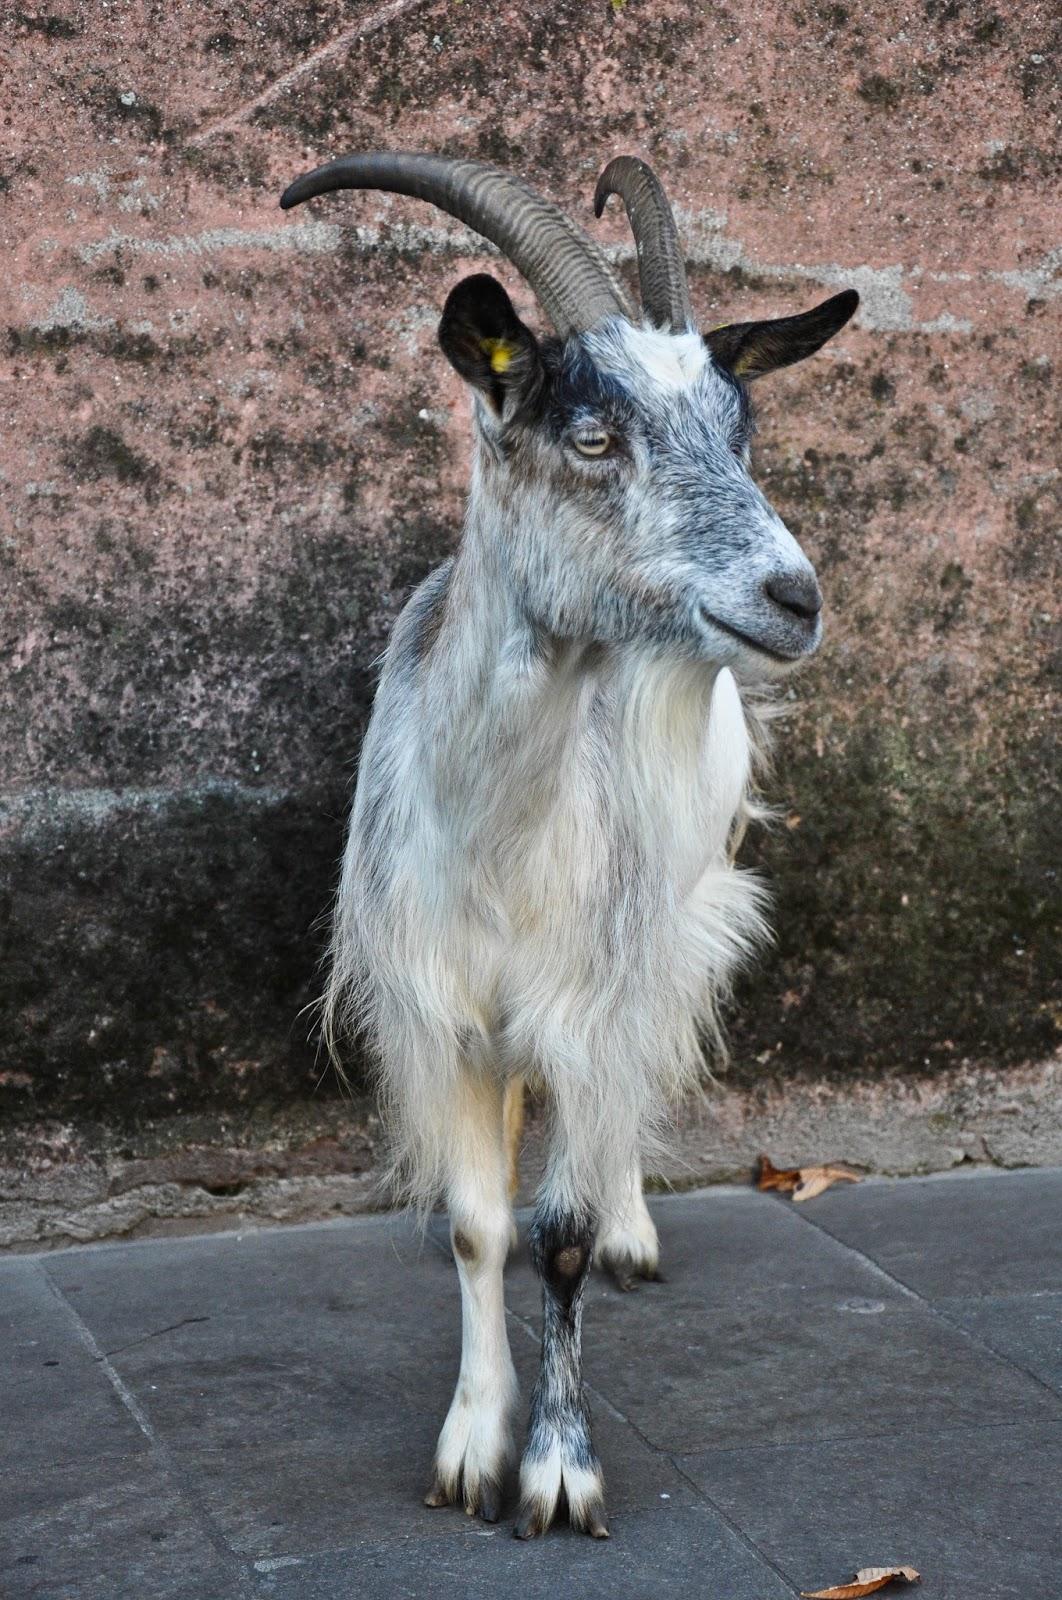 Goat, Petting Zoo, Natale di Fiaba 2015, Thiene, Italy